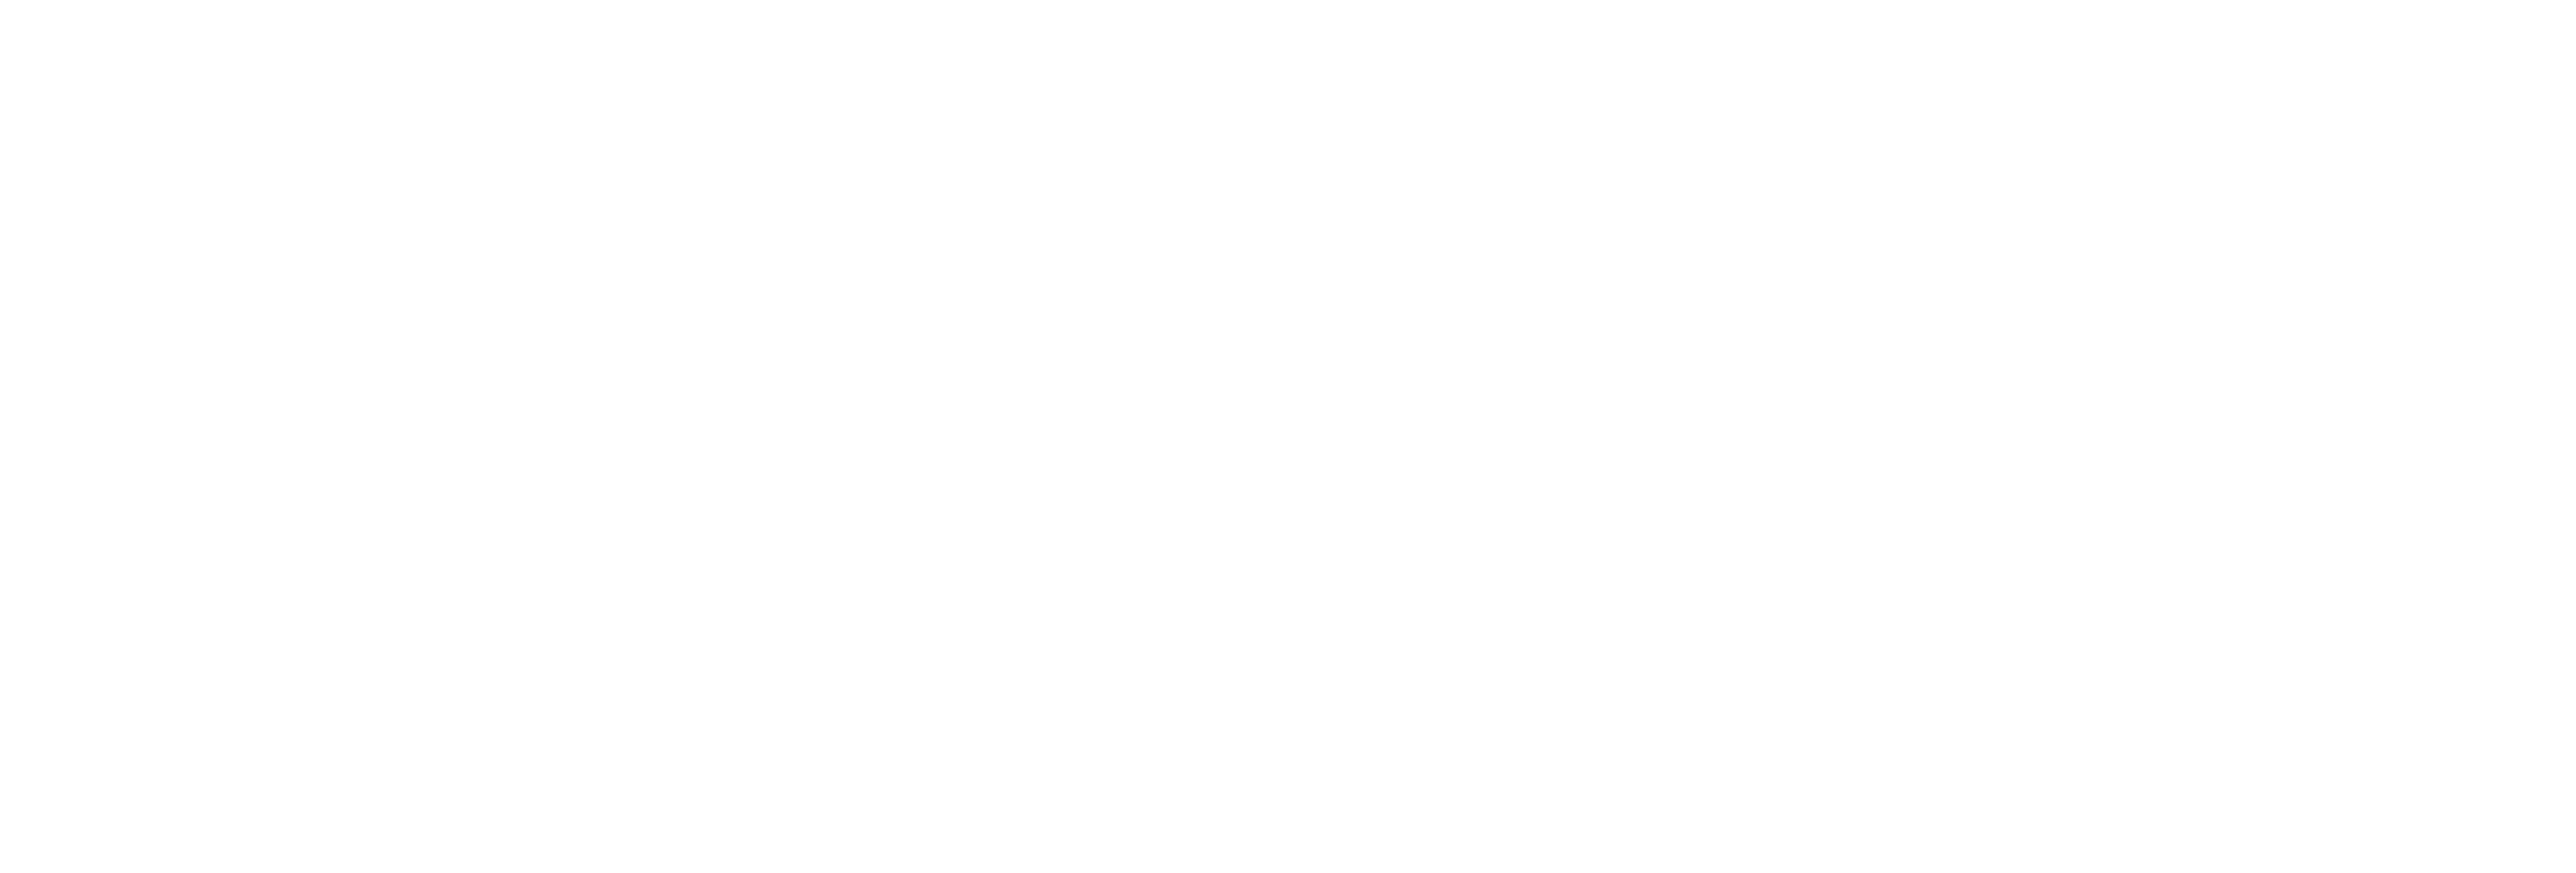 Patria Lusa